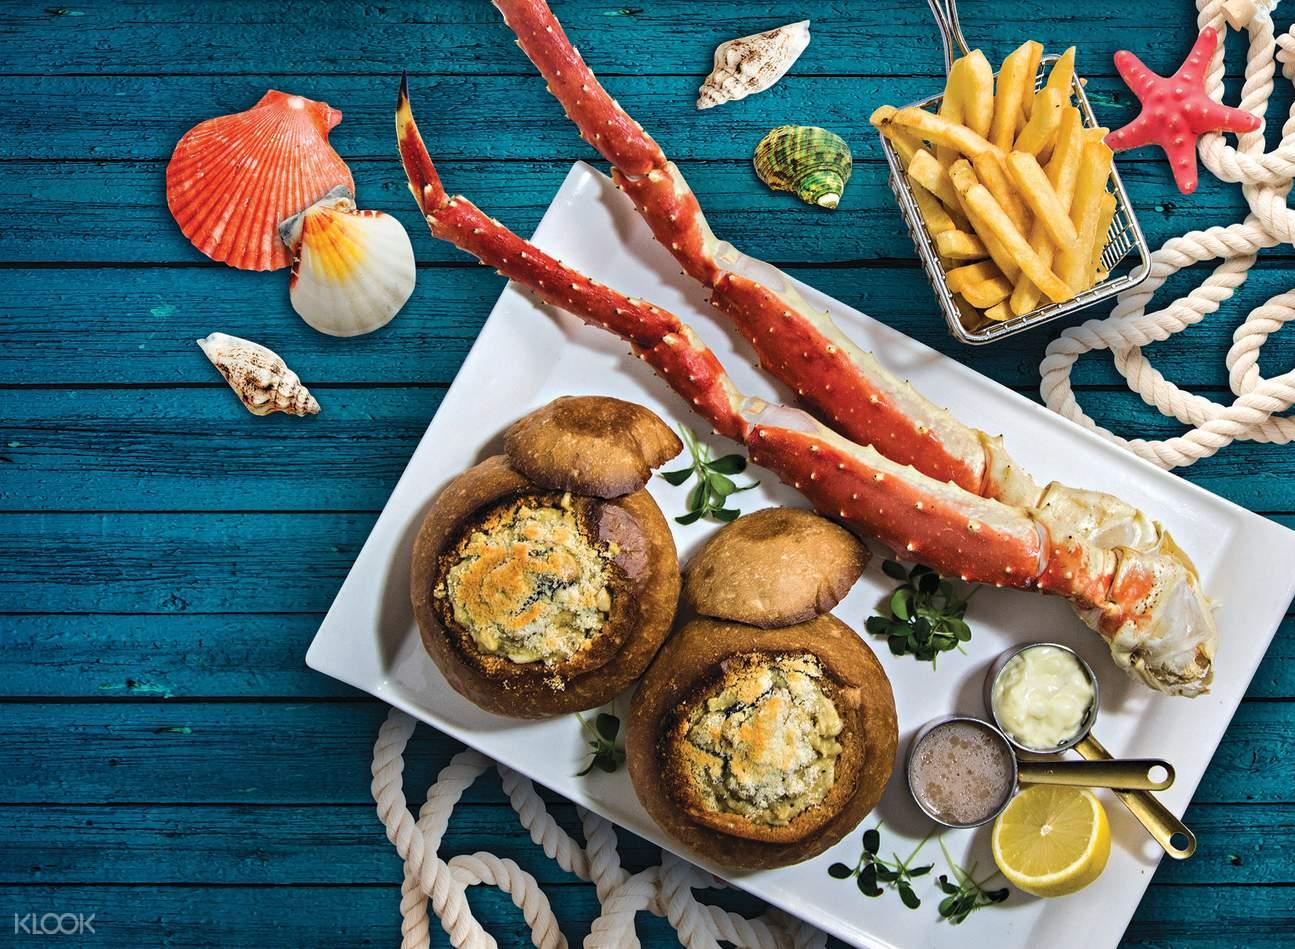 Alaska King Crab dinner set